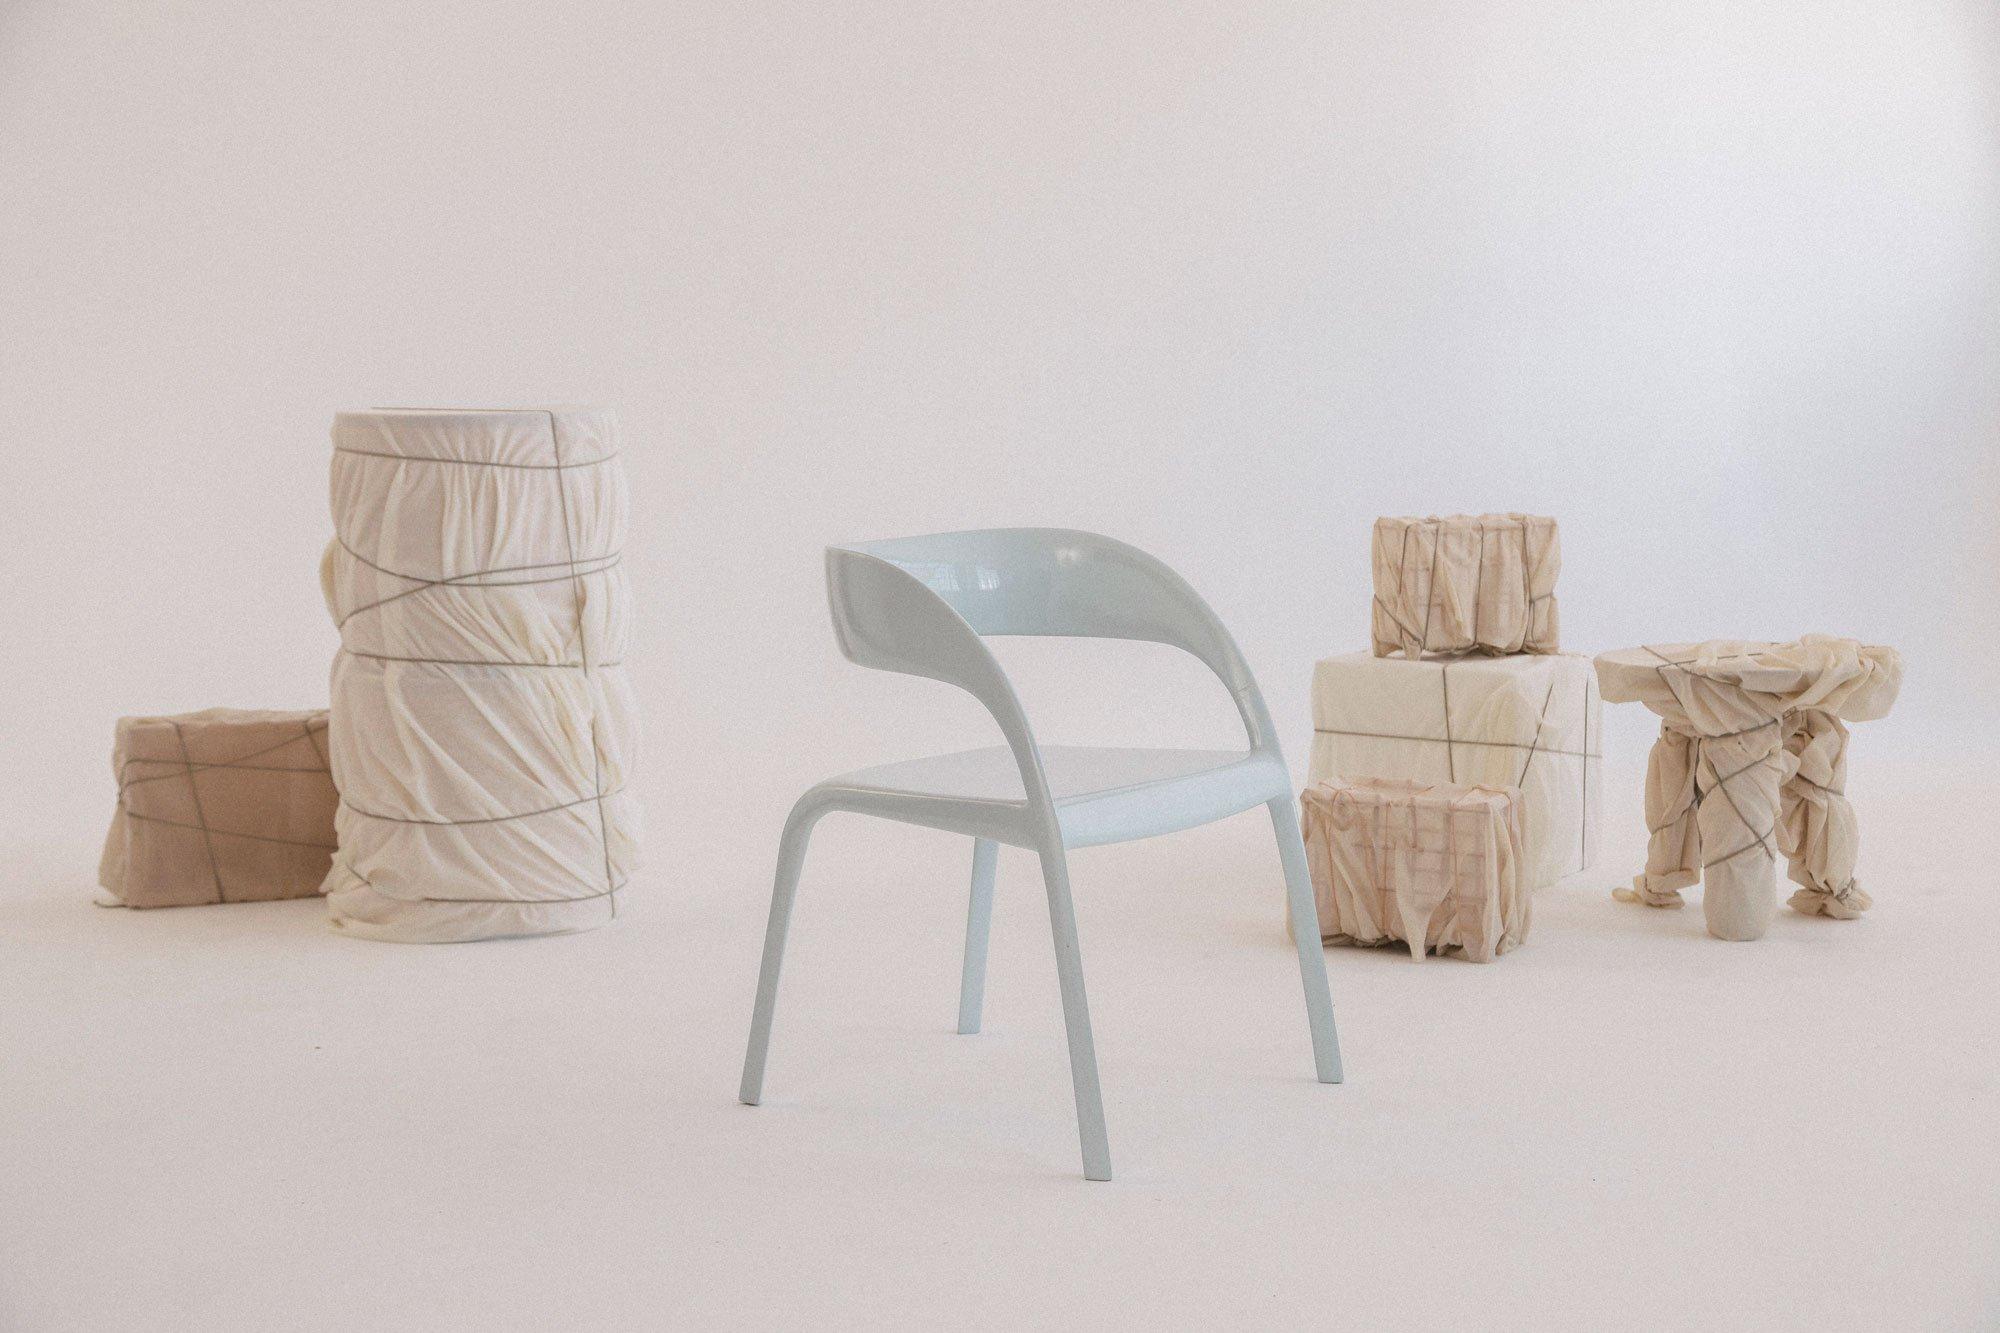 Ukurant Objects, 3daysofdesign 2020, jeunes designers, Kamma Rosa Schytte